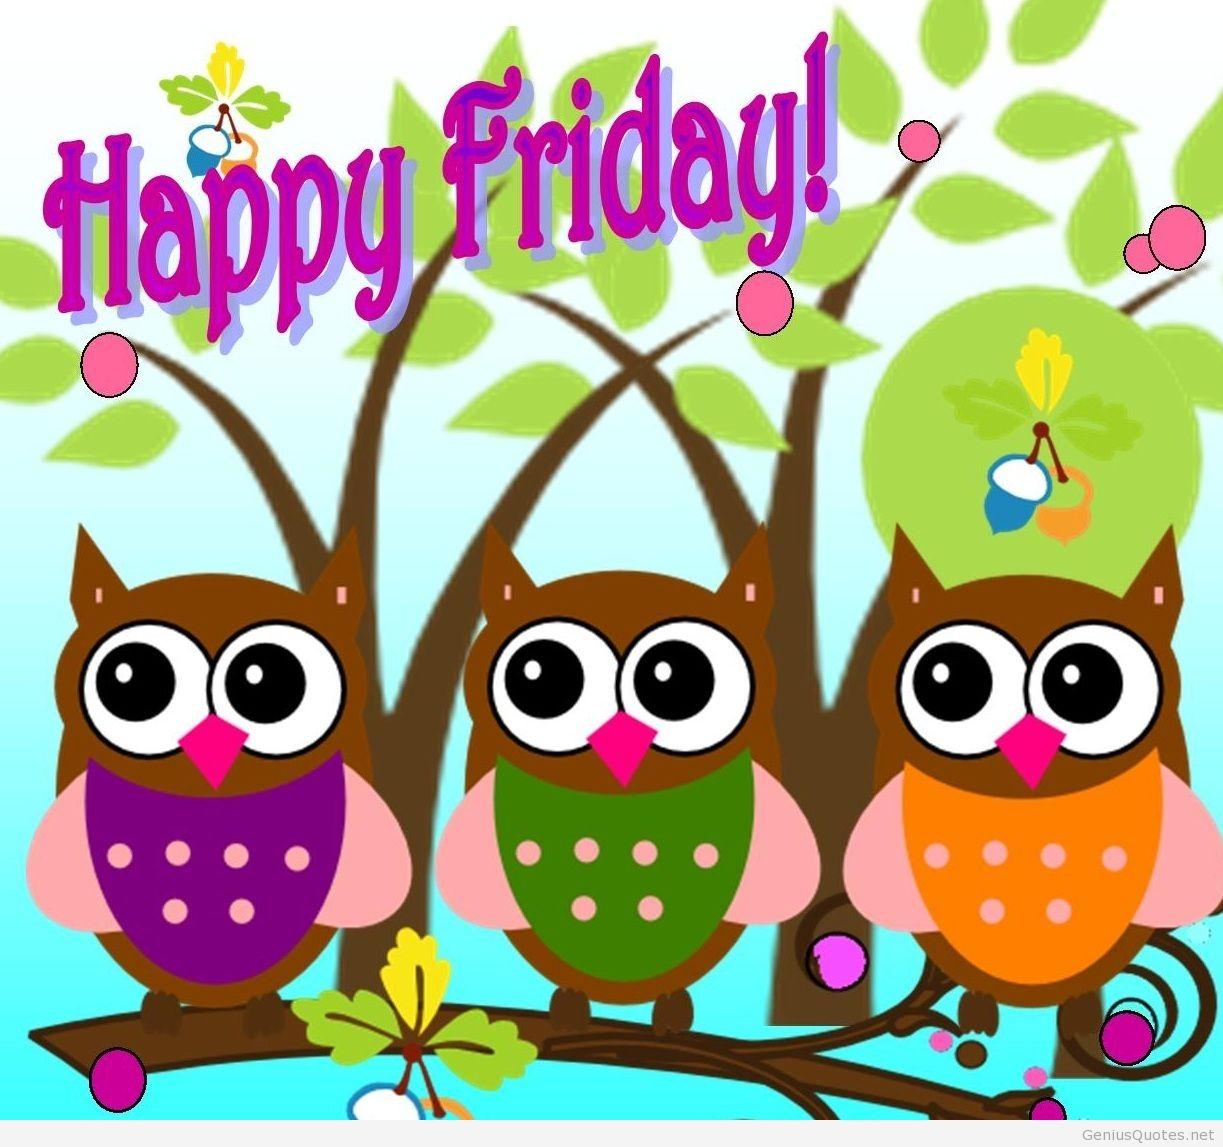 Happy Friday Quotes Funny Happy Friday C-Happy Friday Quotes Funny Happy Friday Clipart Cartoon 20140904120643-18